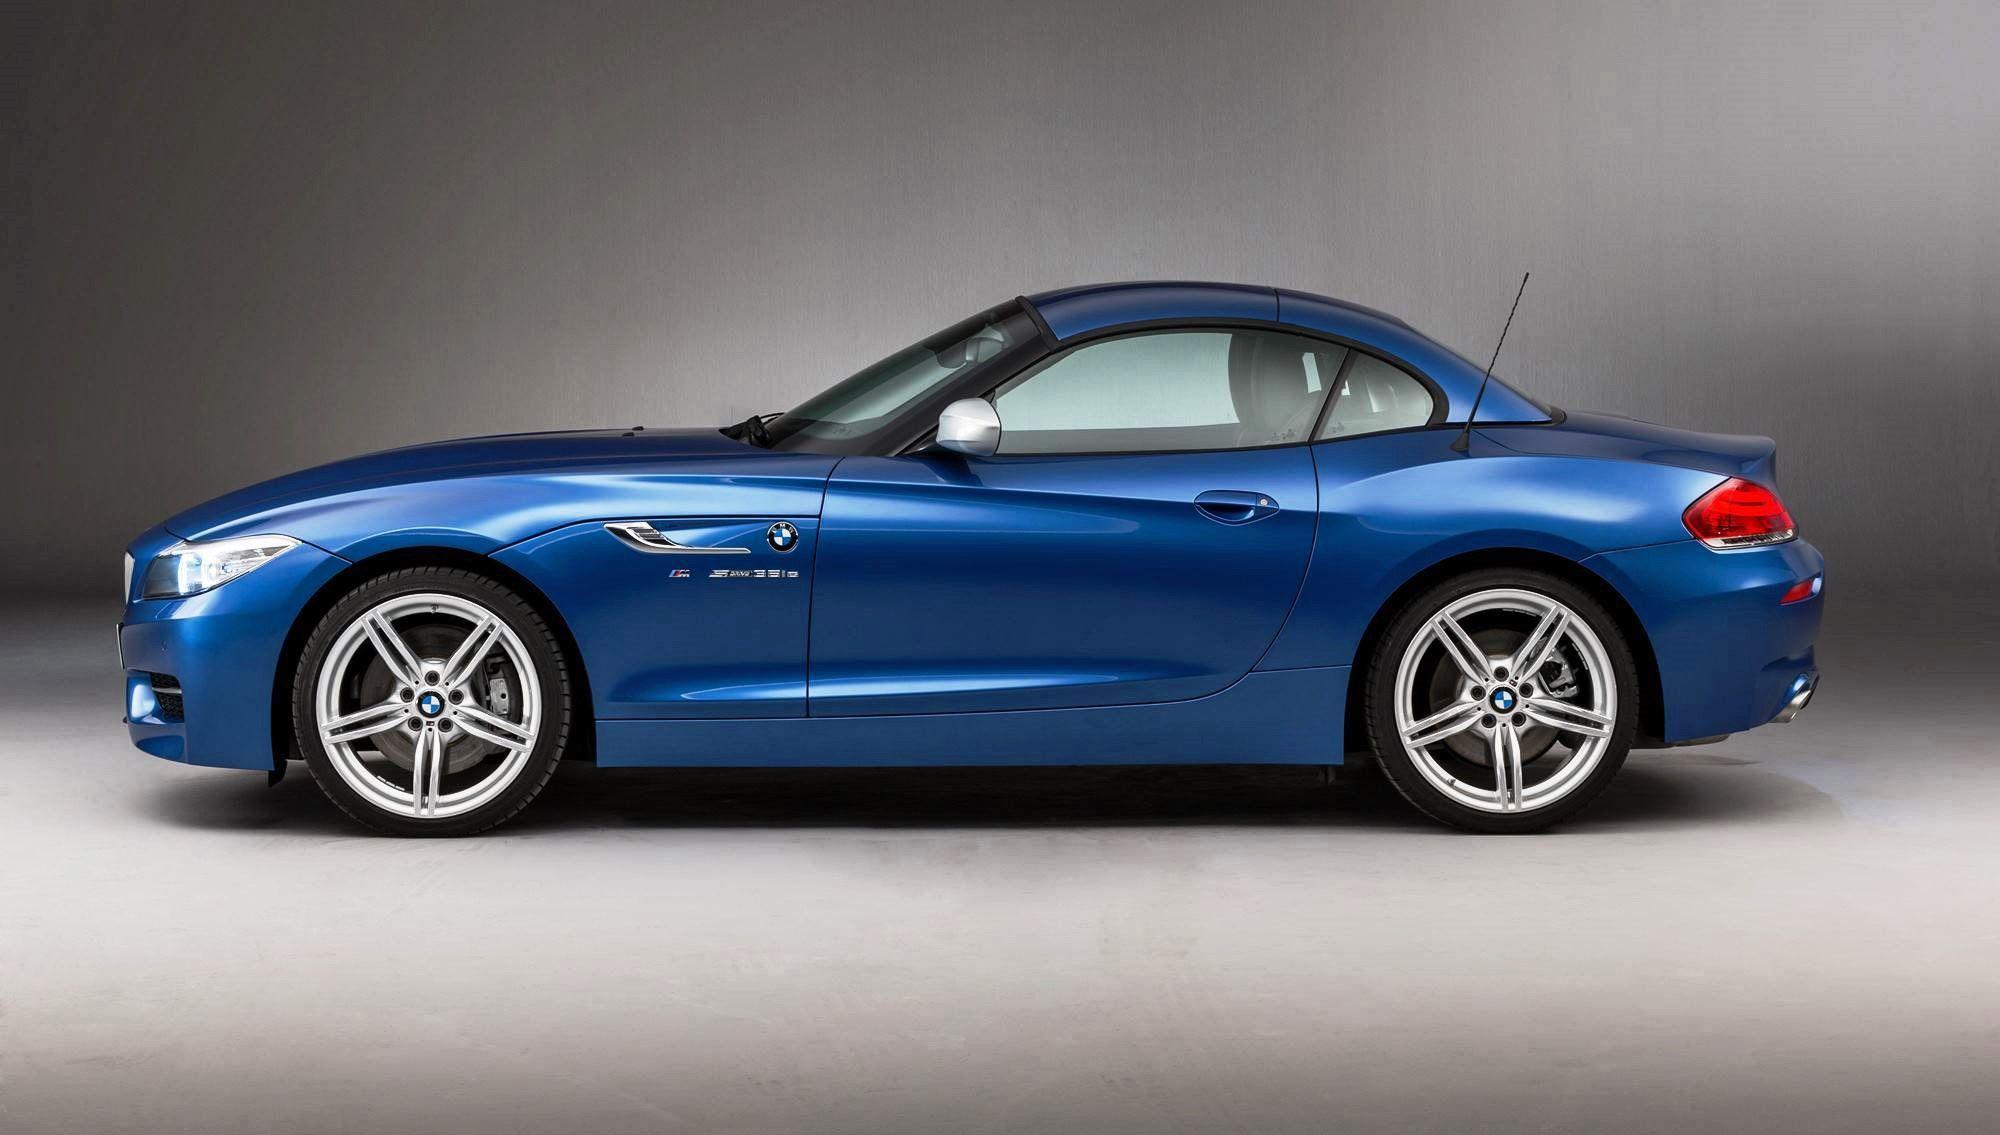 2017 BMW_Z4 HD Wallpaper - Car Wallpaper Hub